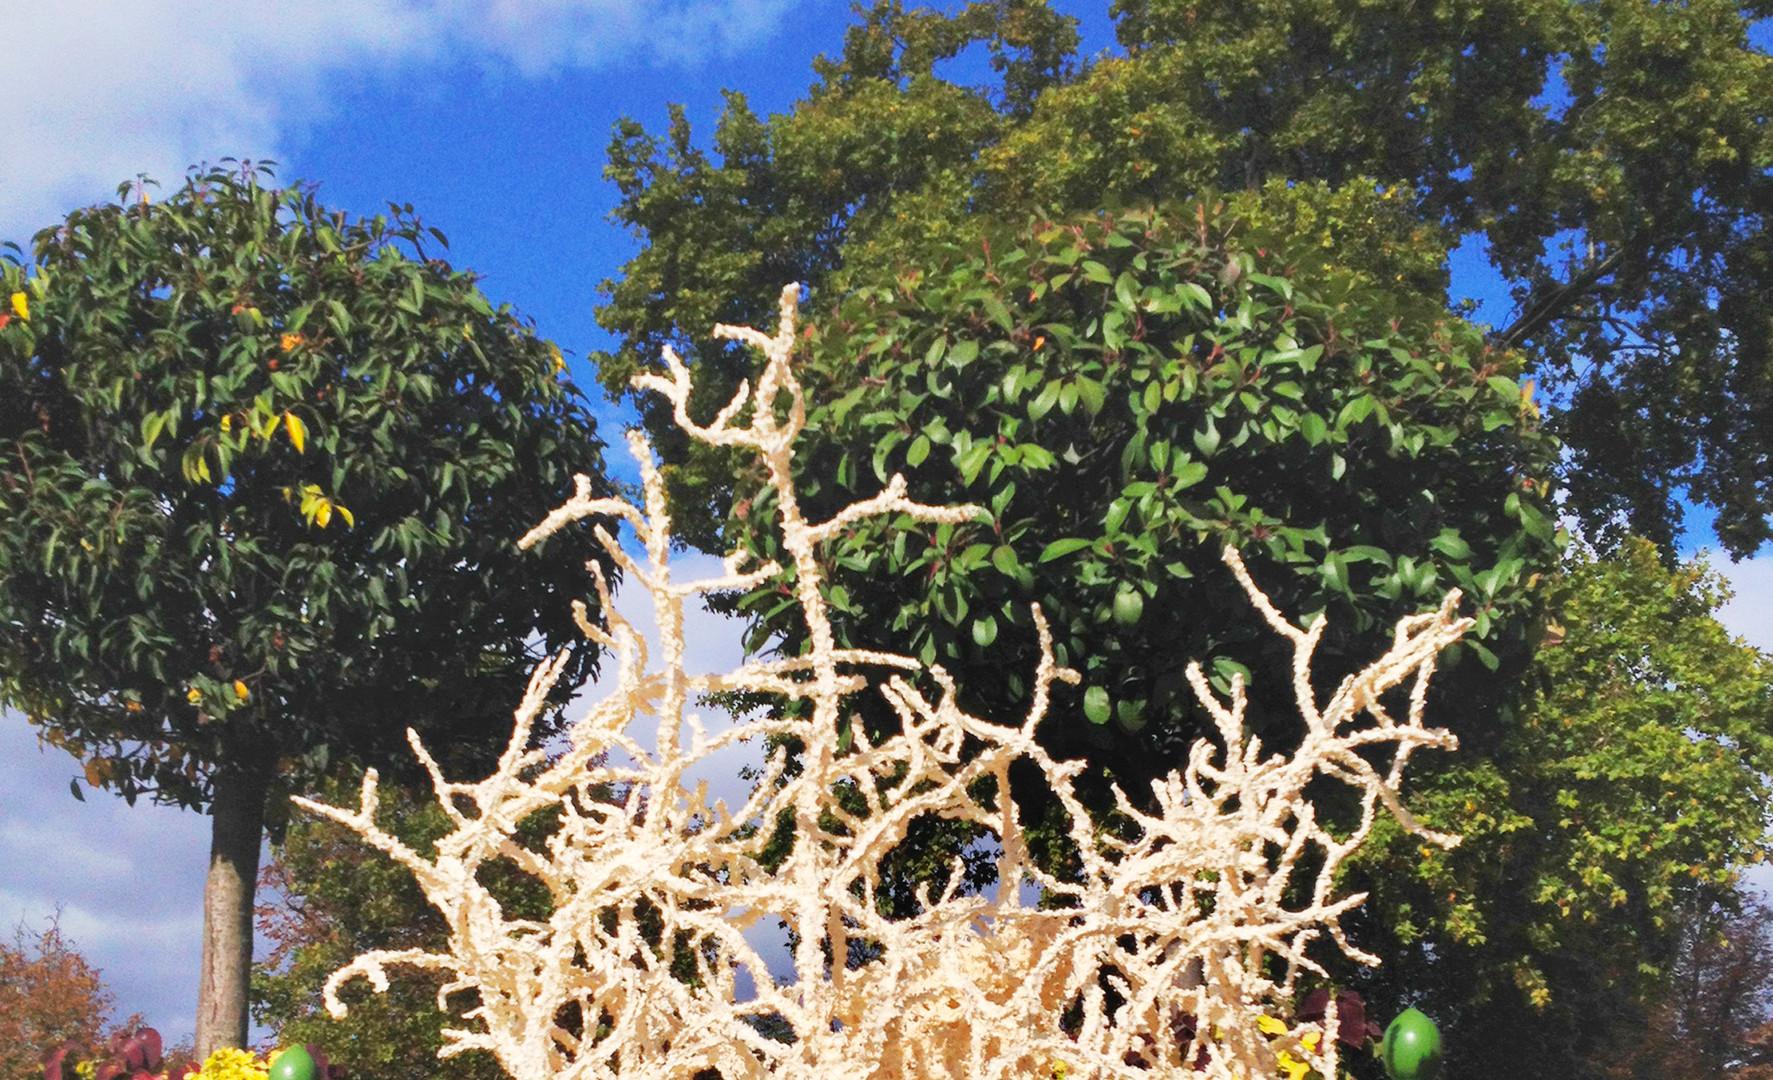 growingtogether_2.jpg